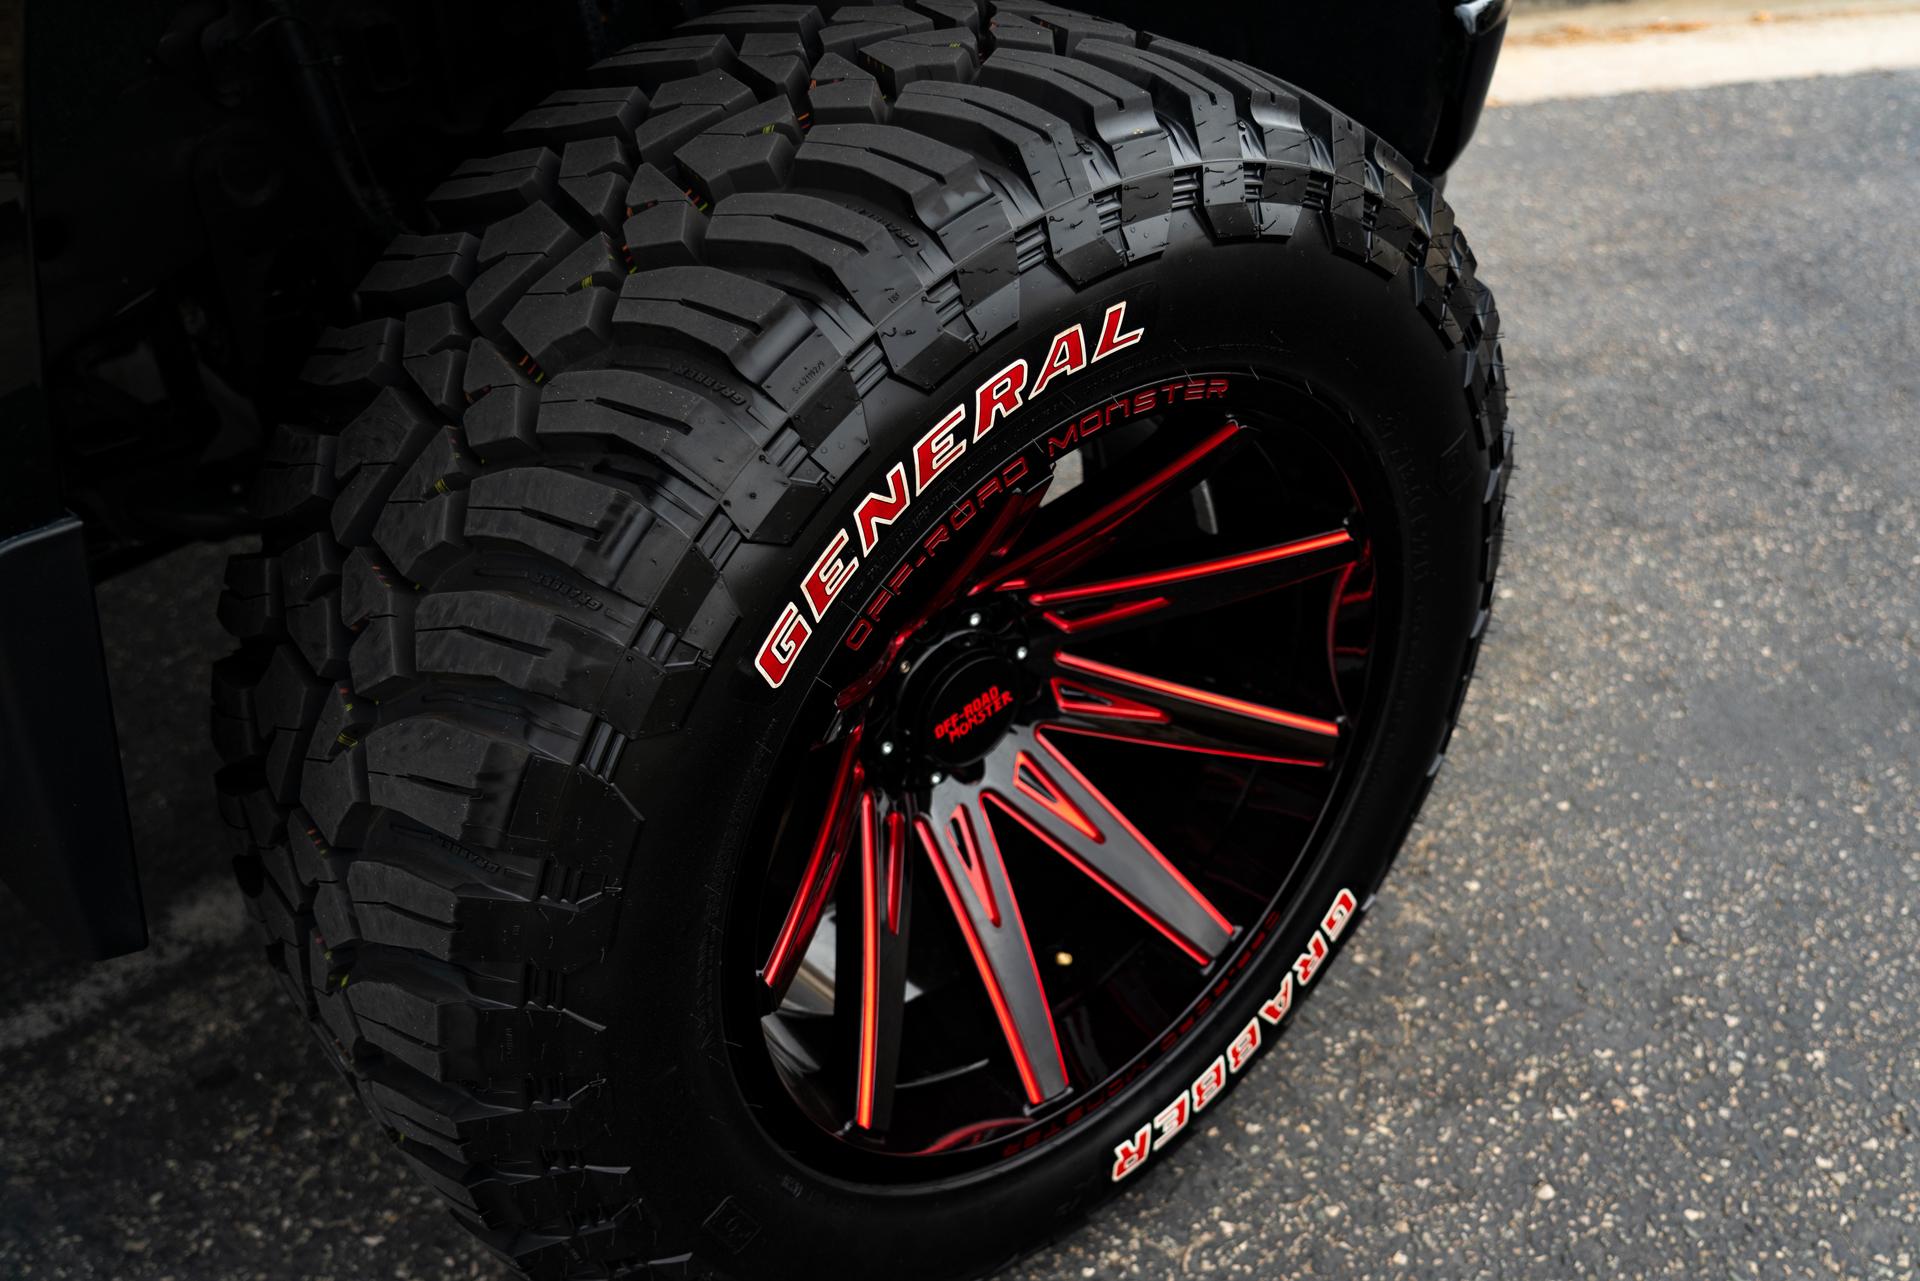 M25 Off-Road Monster Wheels on a Chevrolet Silverado LTZ